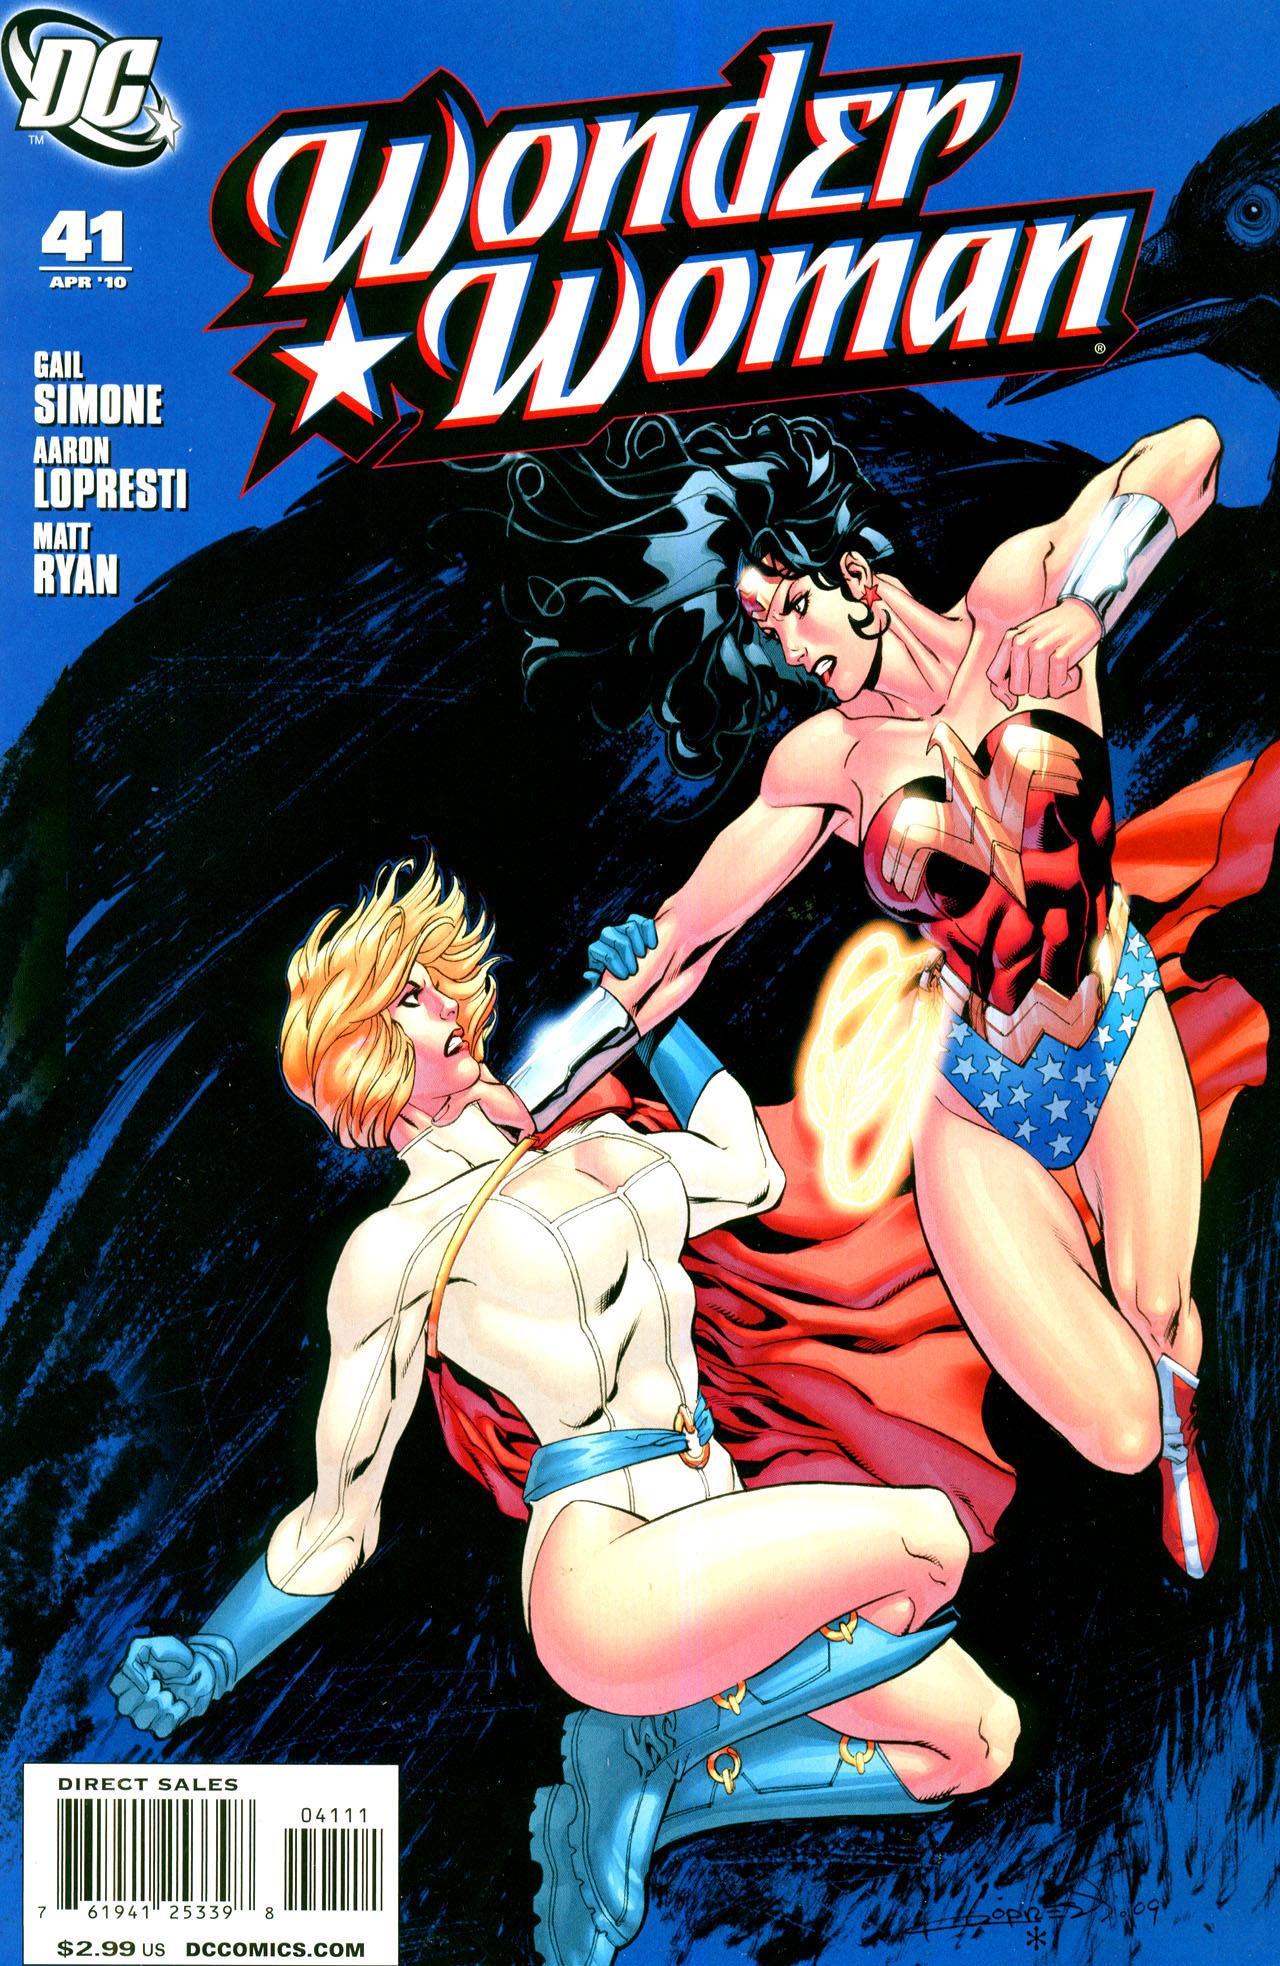 Read online Wonder Woman (2006) comic -  Issue #41 - 1